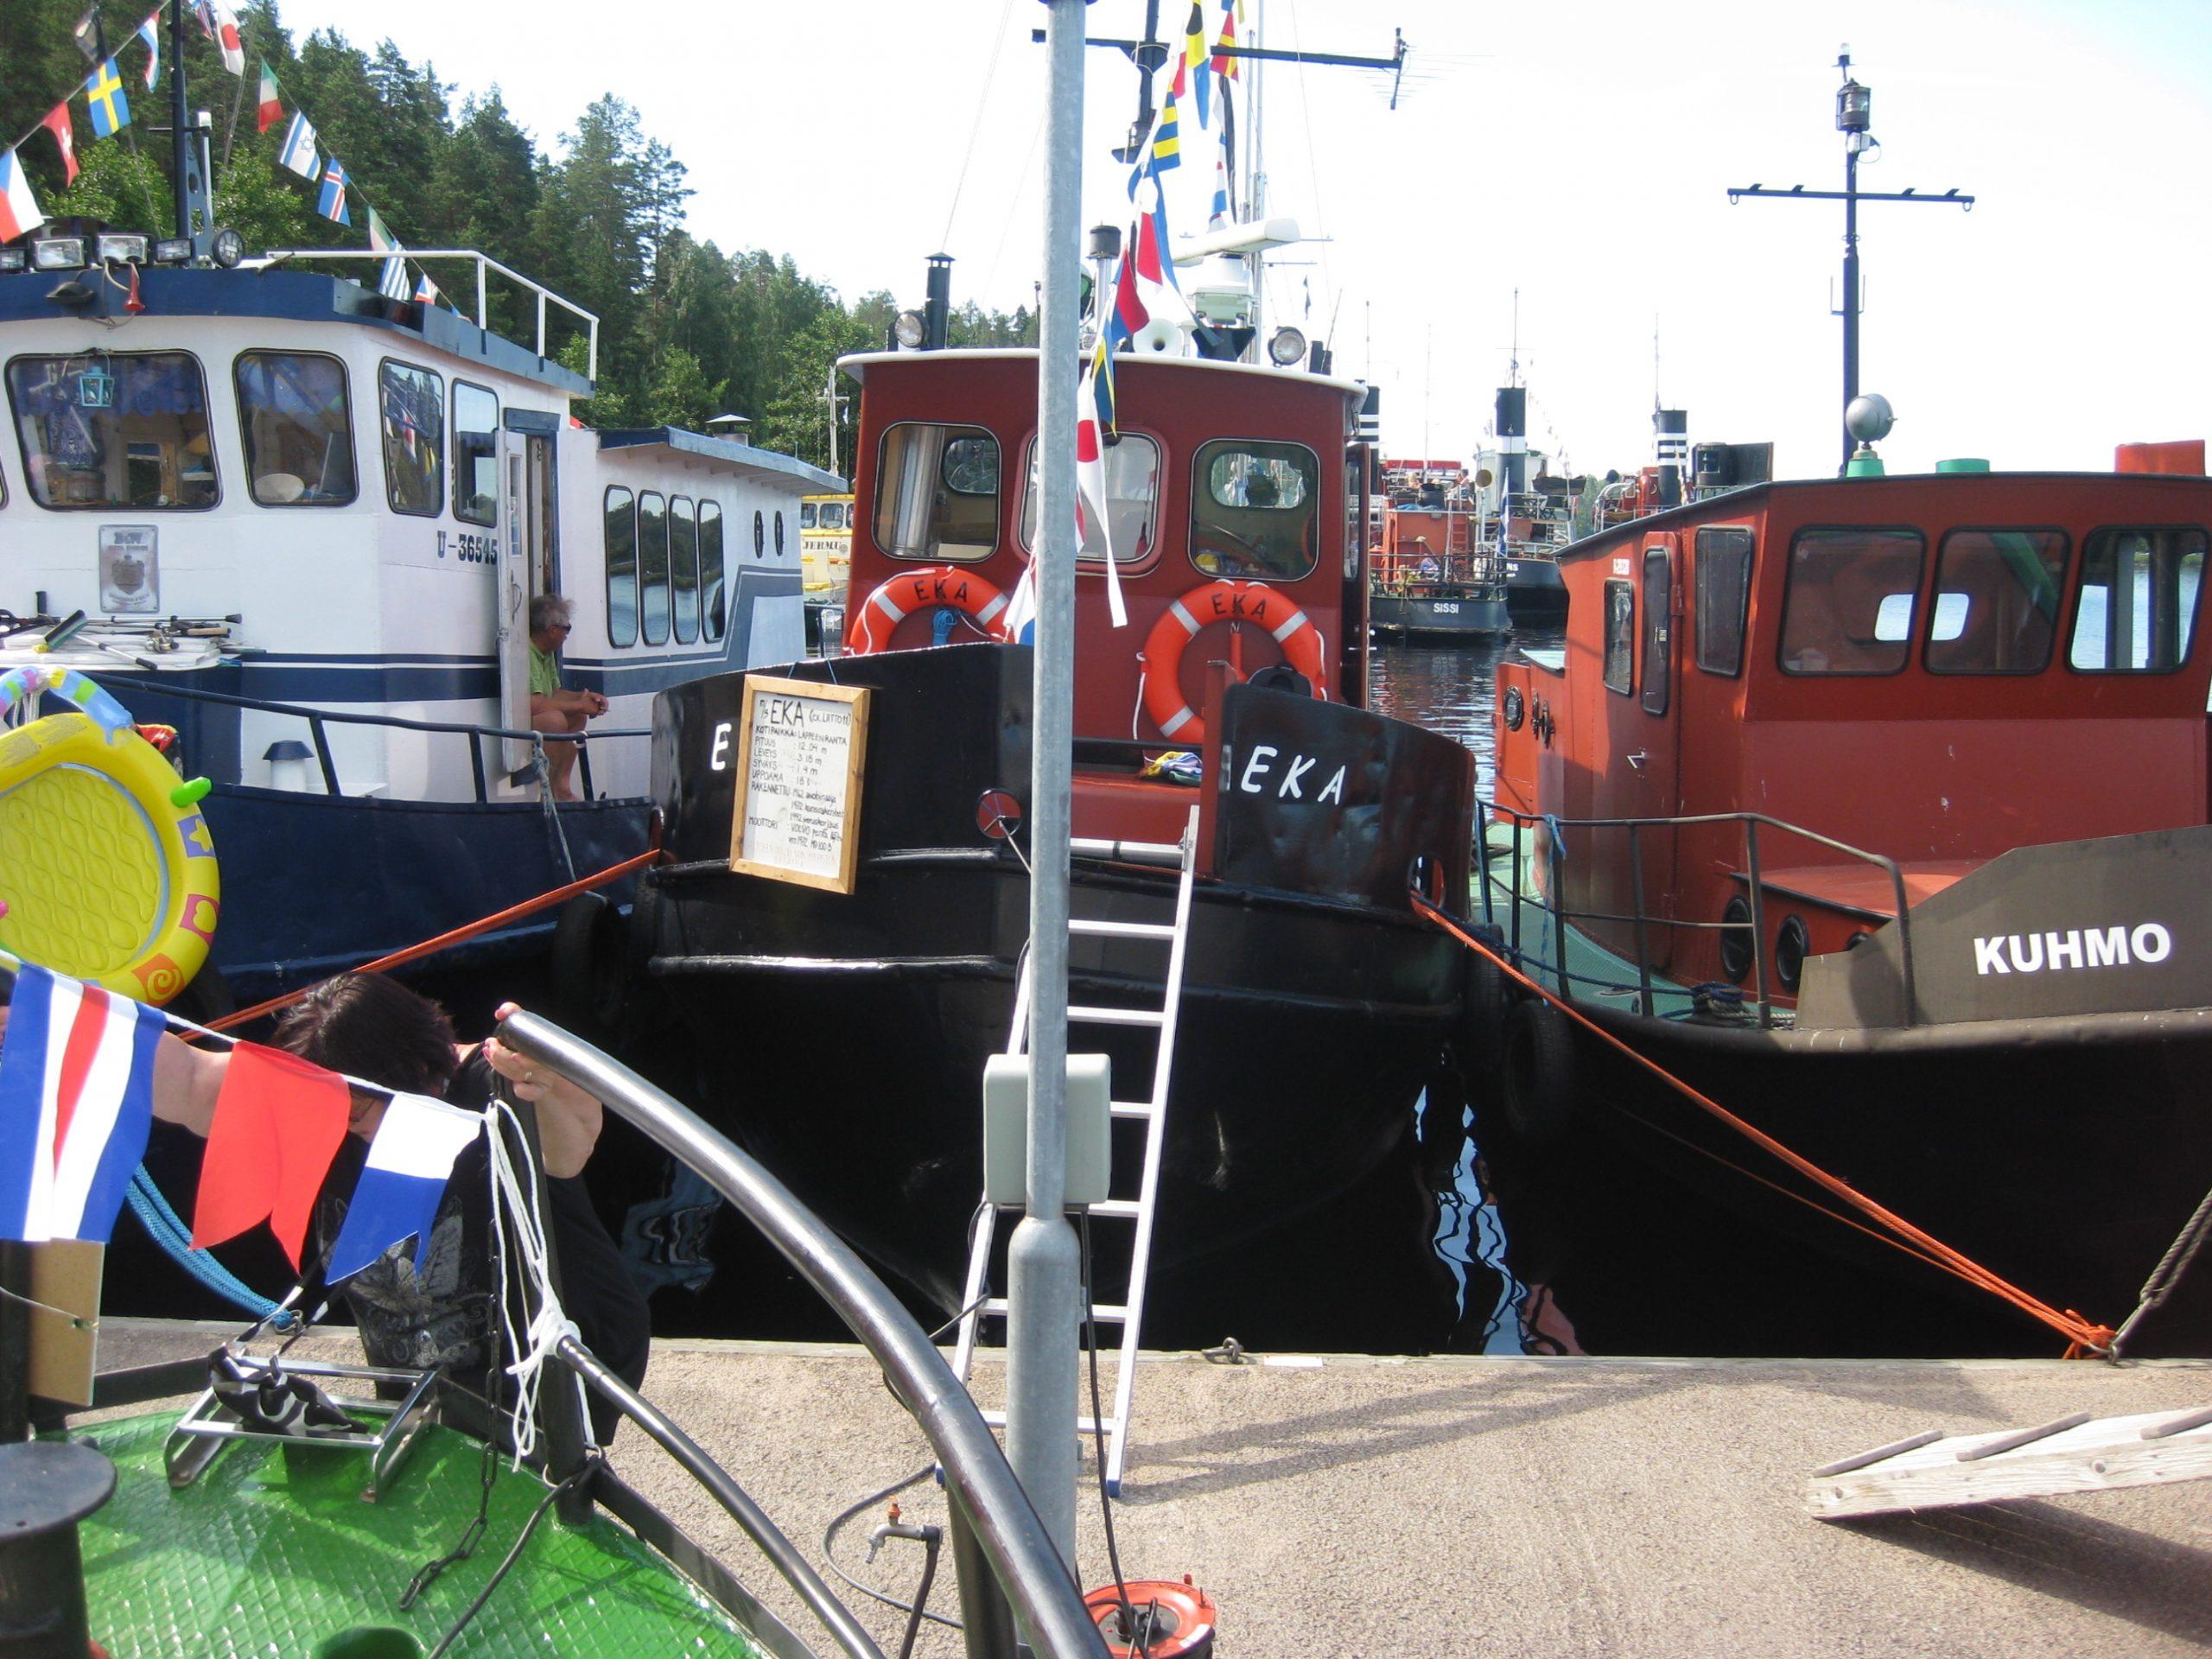 2009 Imatra4